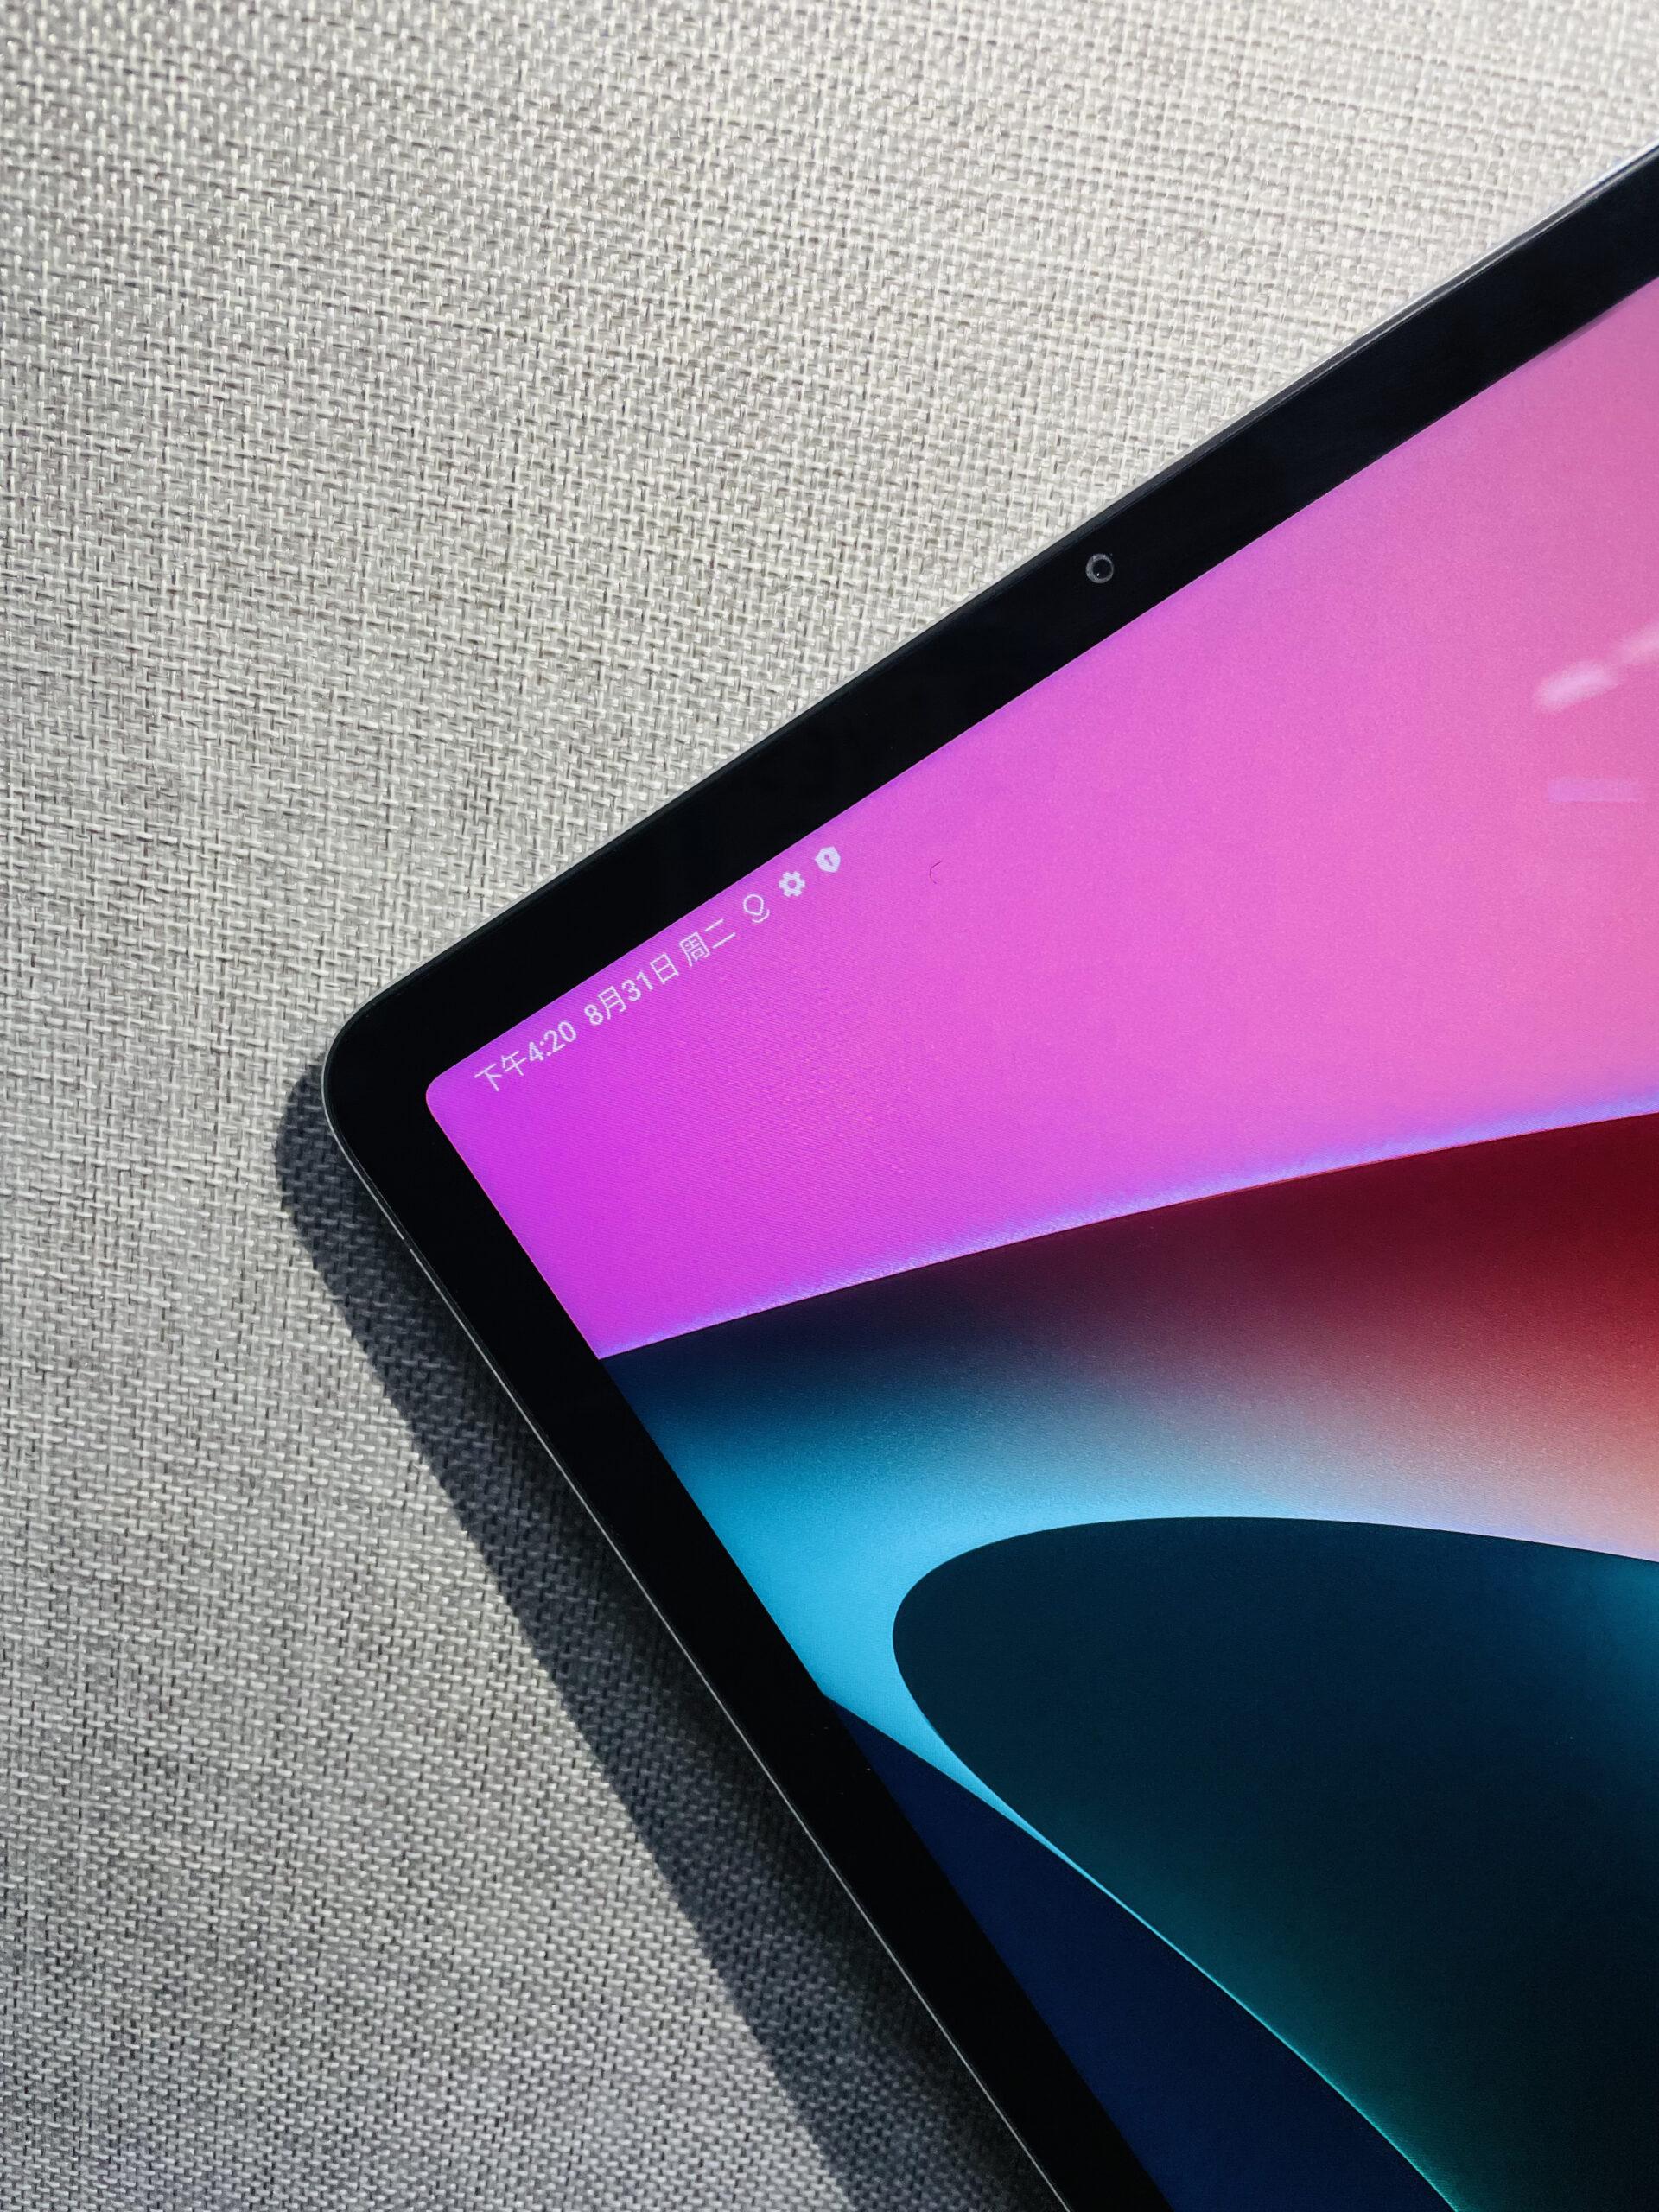 Xiaomi Pad 5 の実機写真